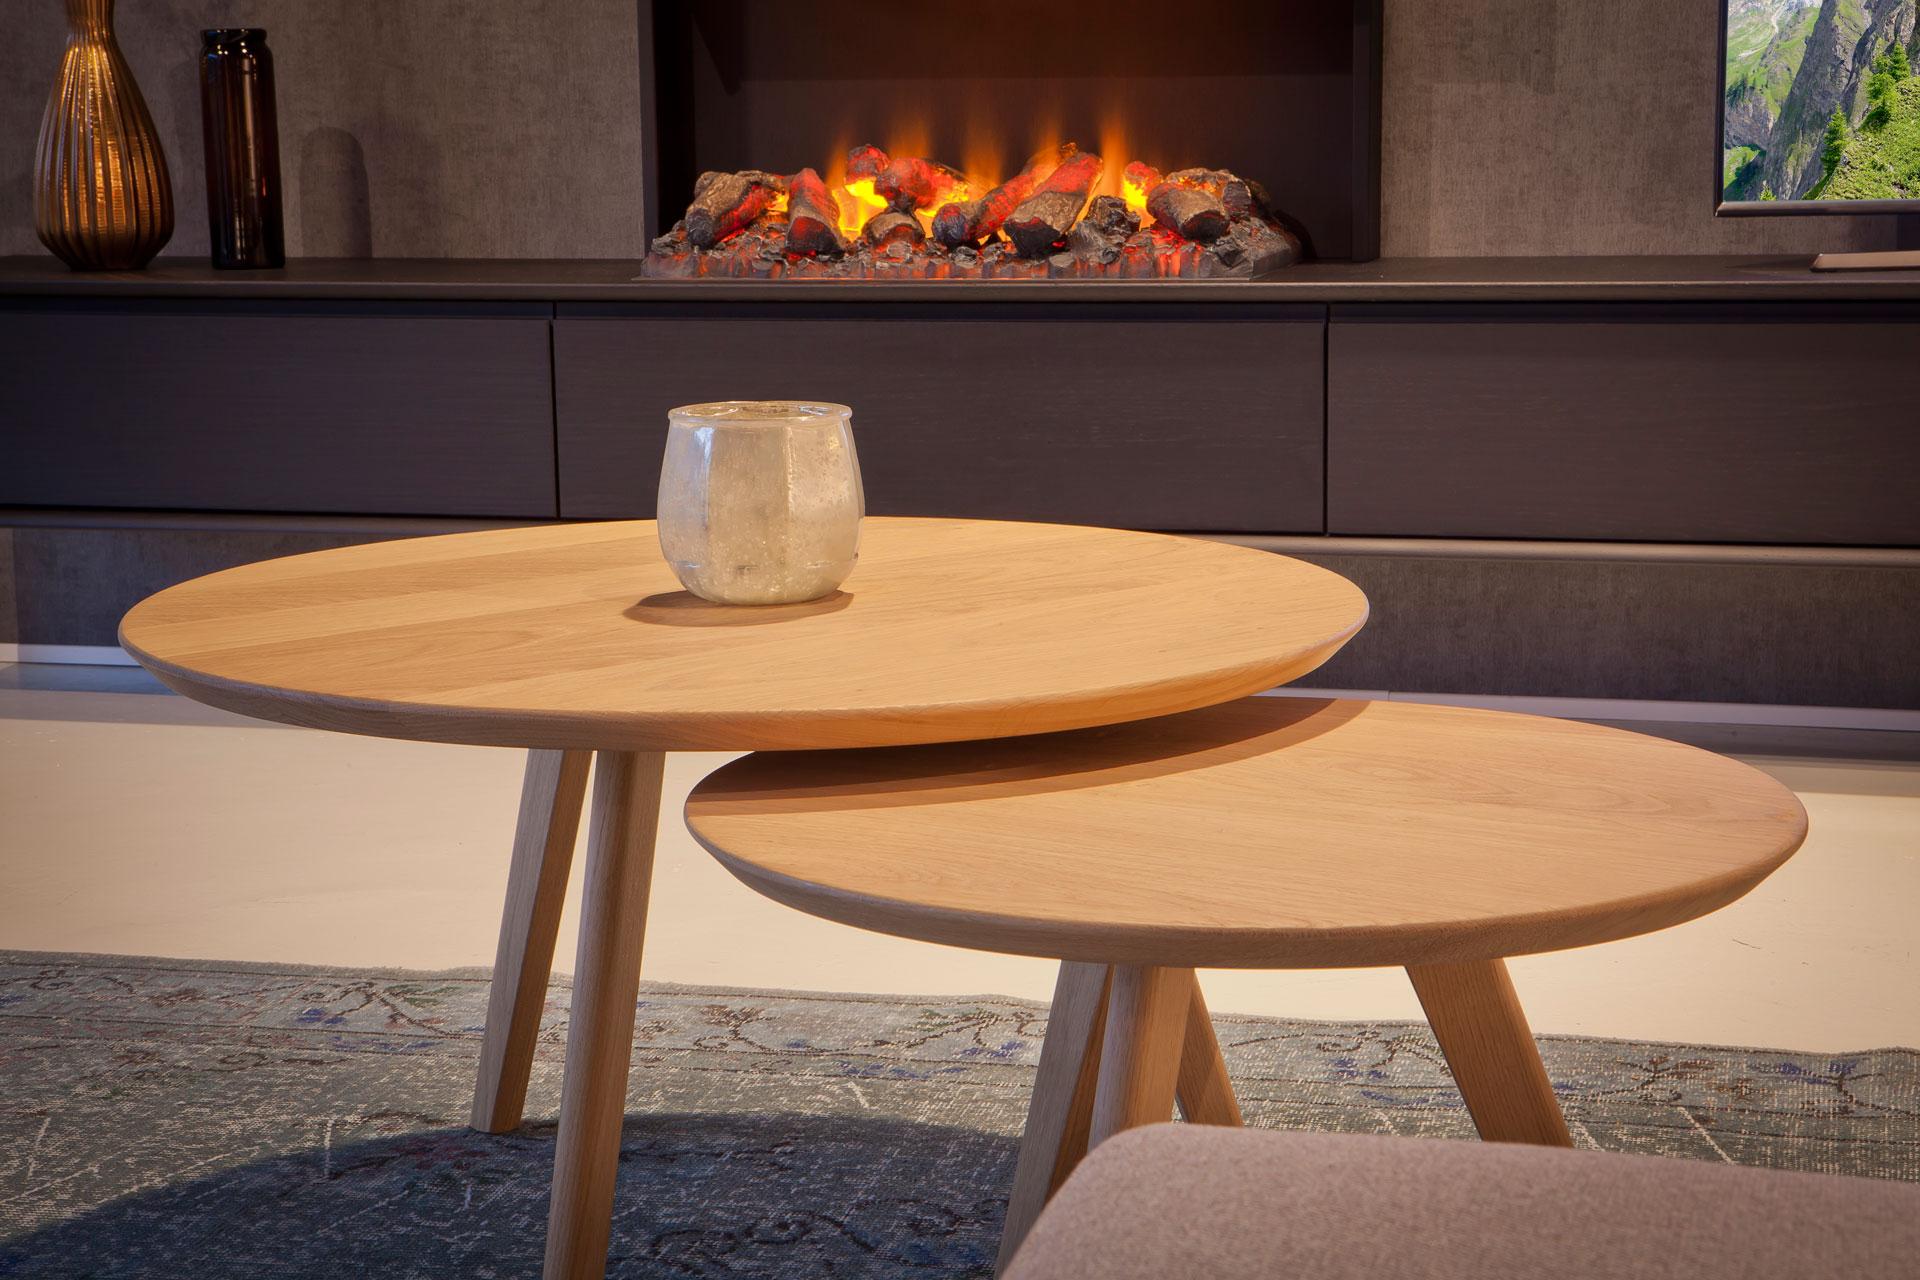 Bks ronde houten salontafels bks meubelen salontafels